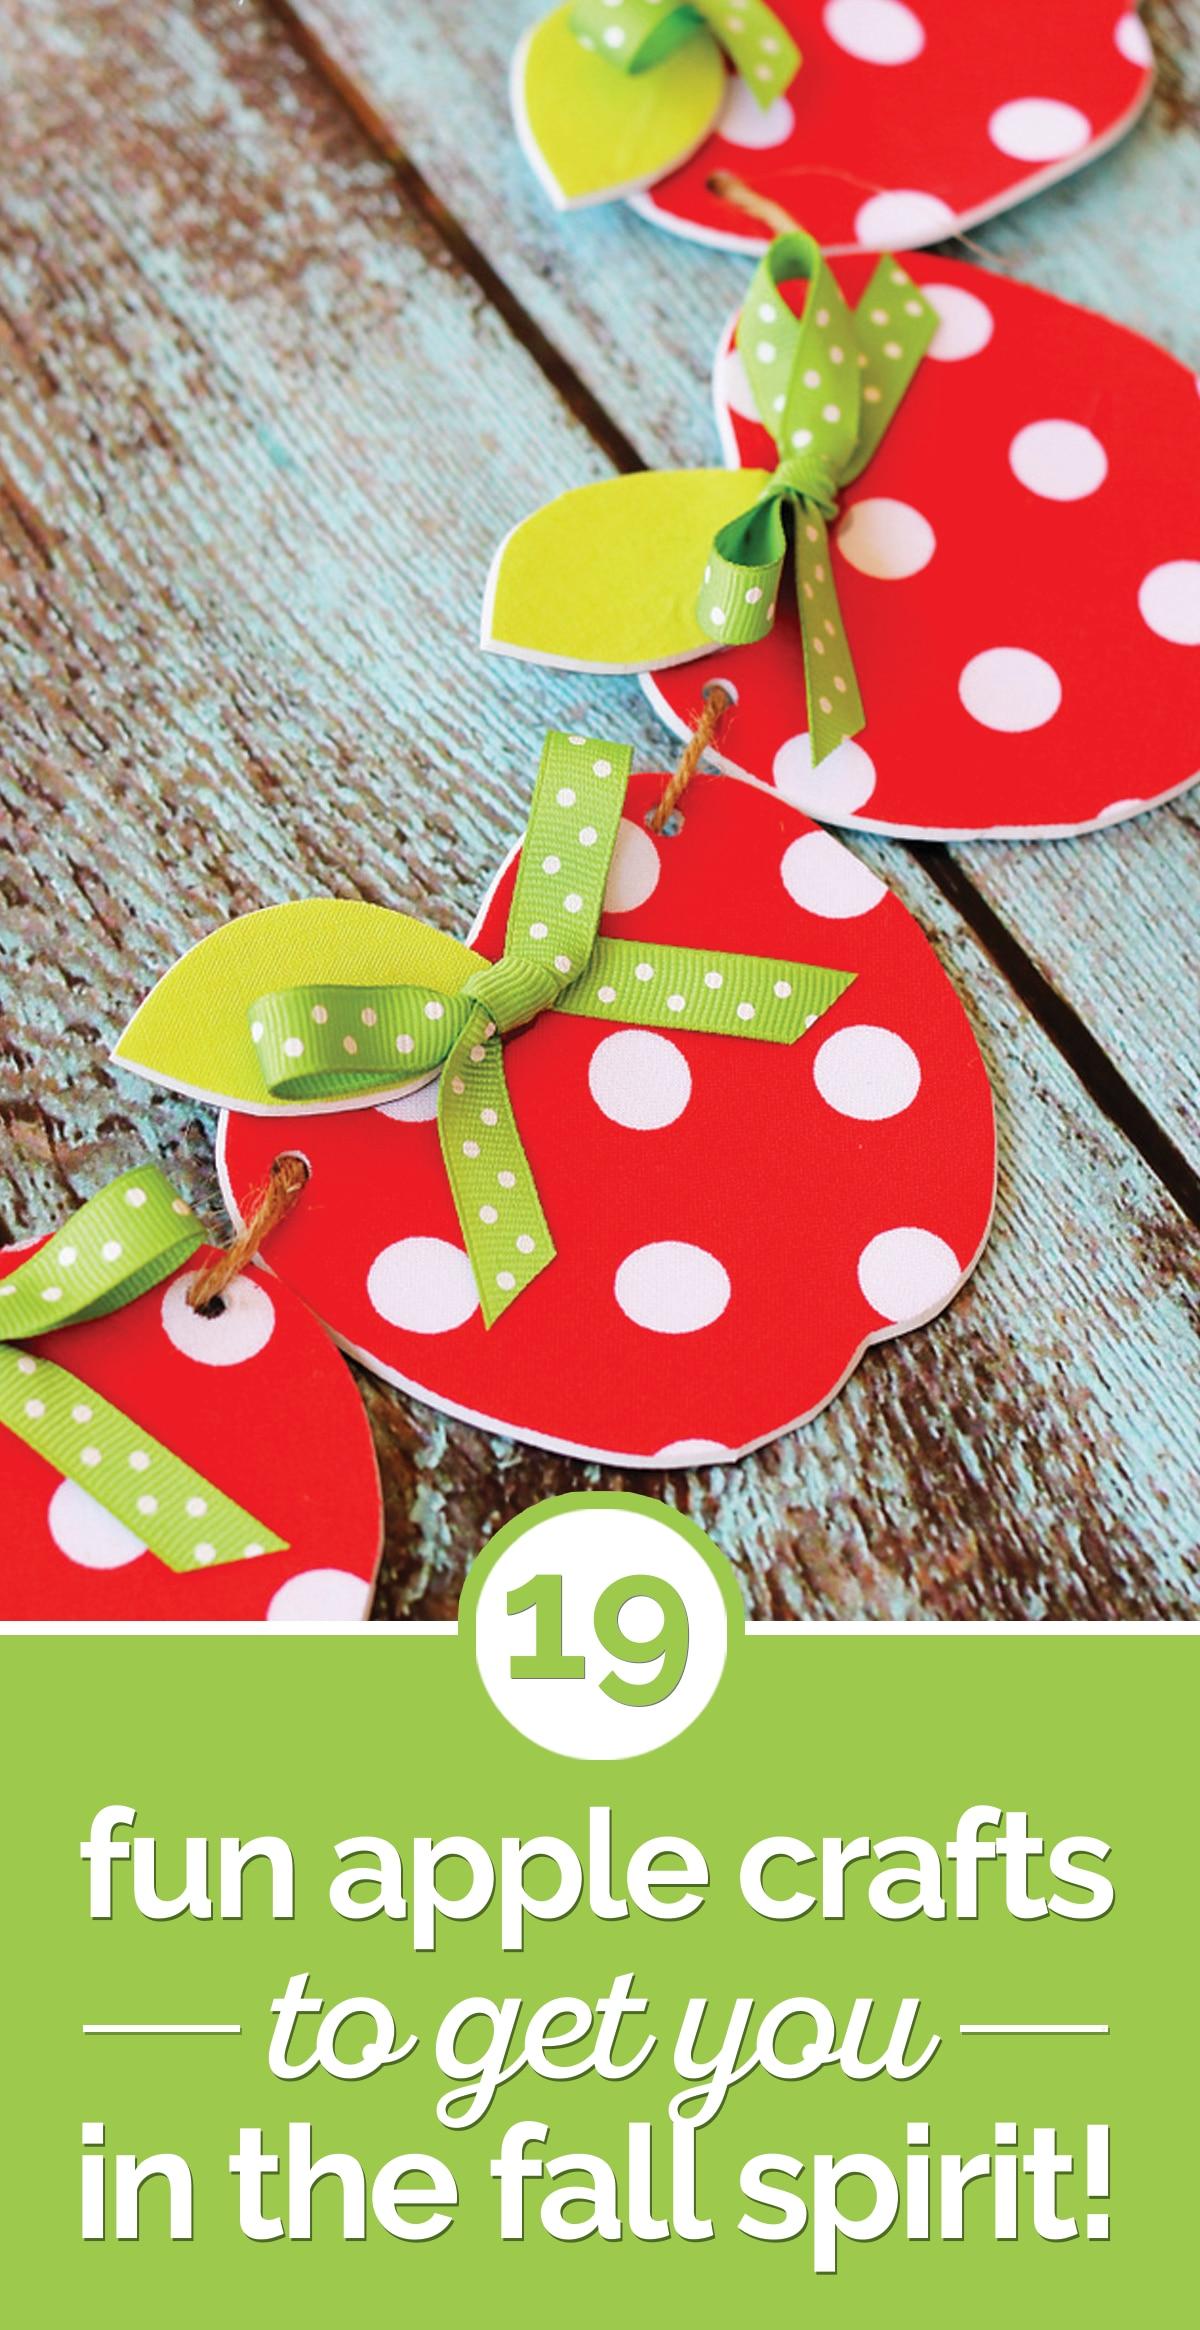 19 Fun Apple Crafts to Get You In the Fall Spirit!   thegoodstuff